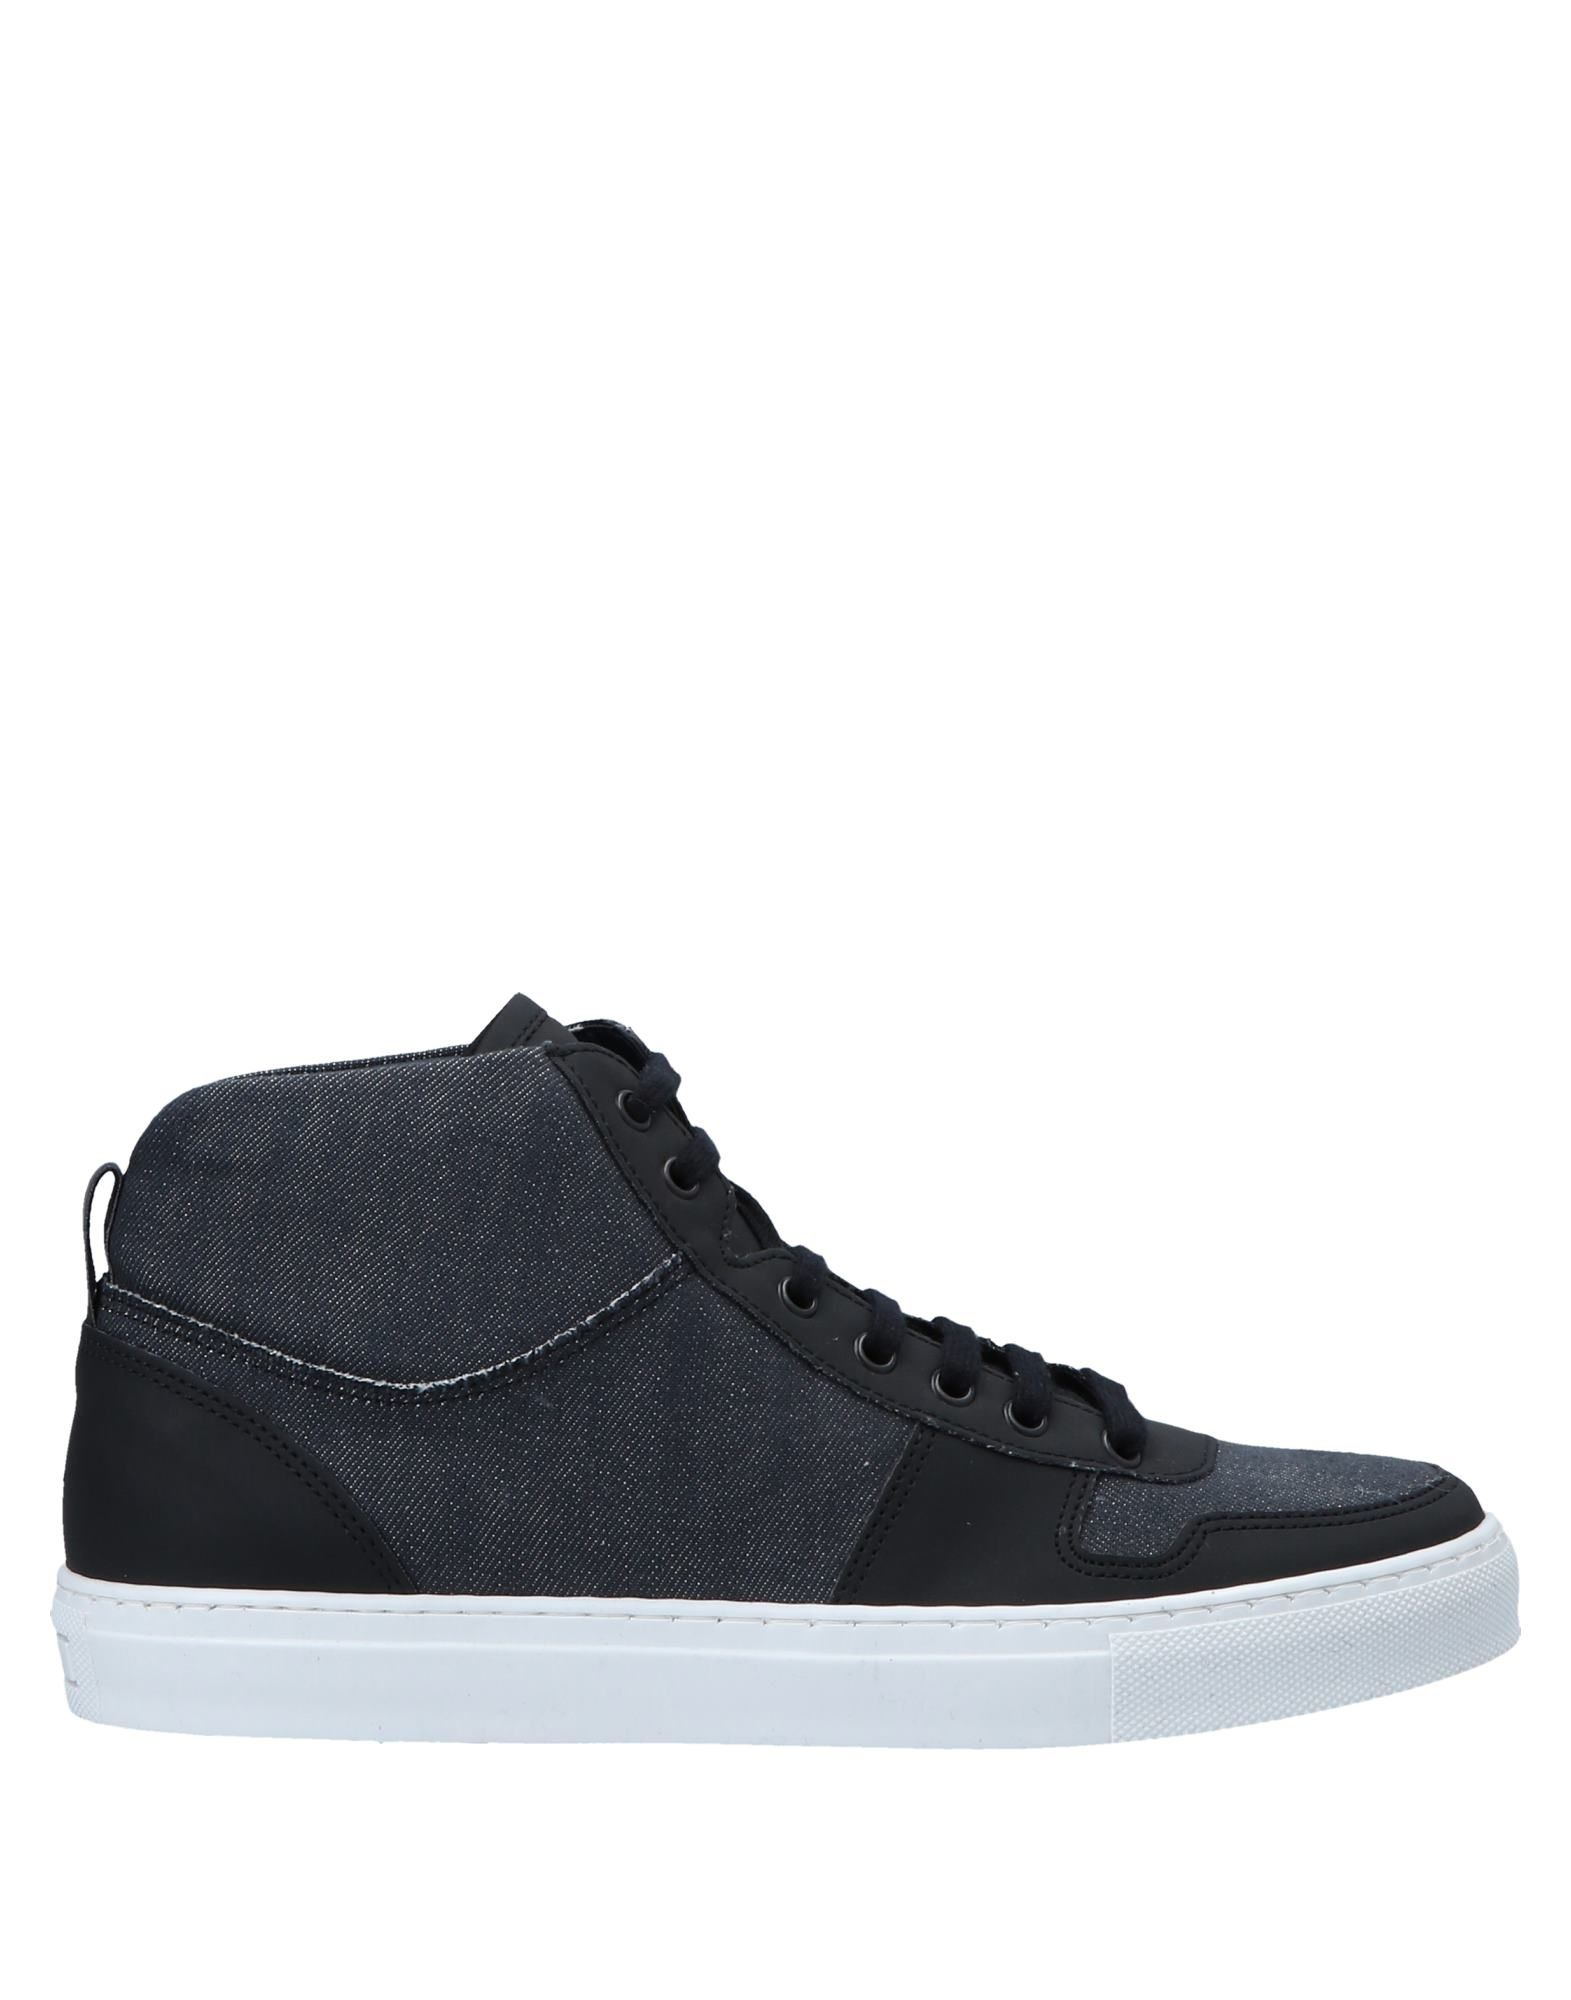 Sneakers Antony Morato Uomo - 11548935TG